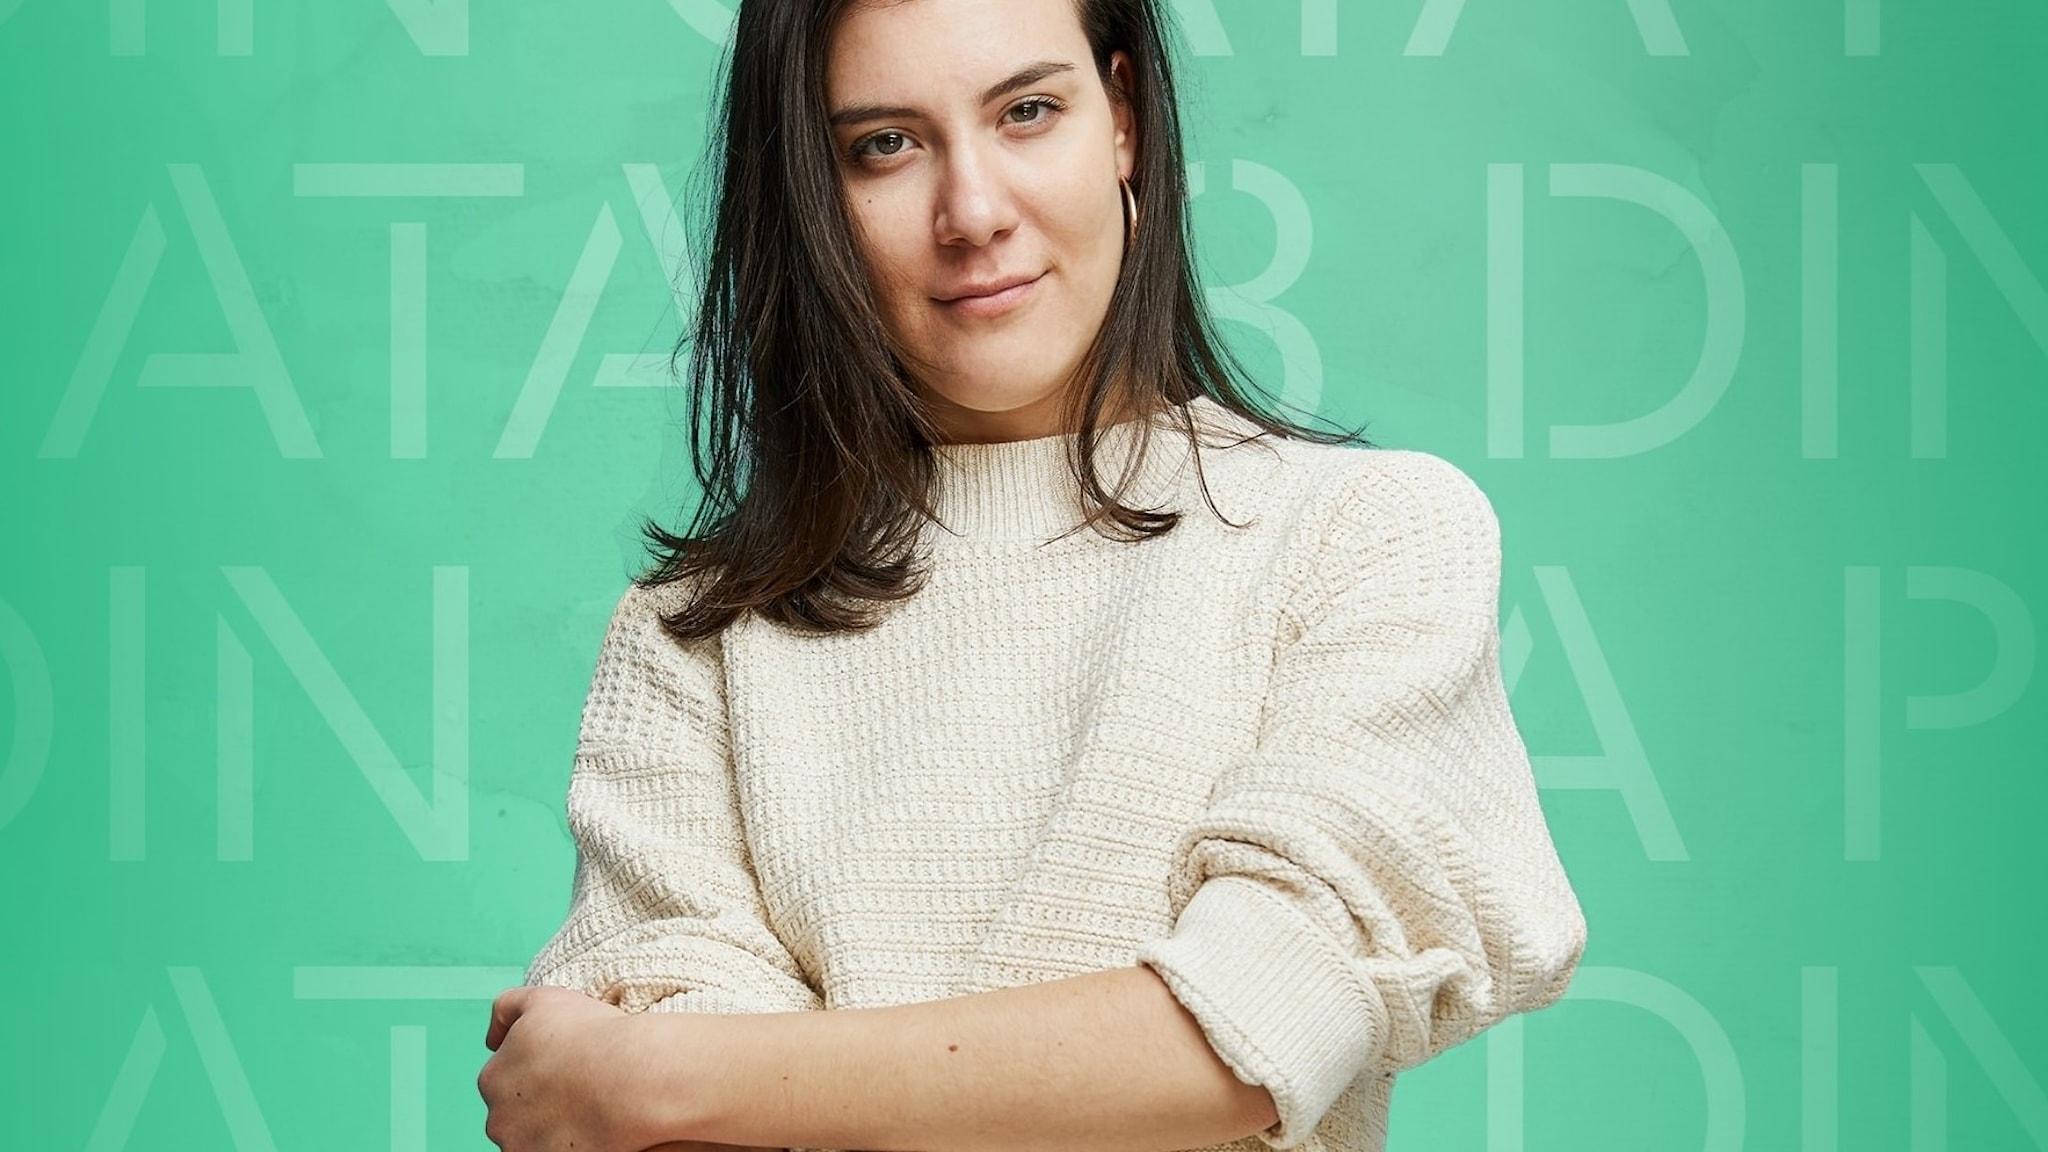 Astrid Zainea